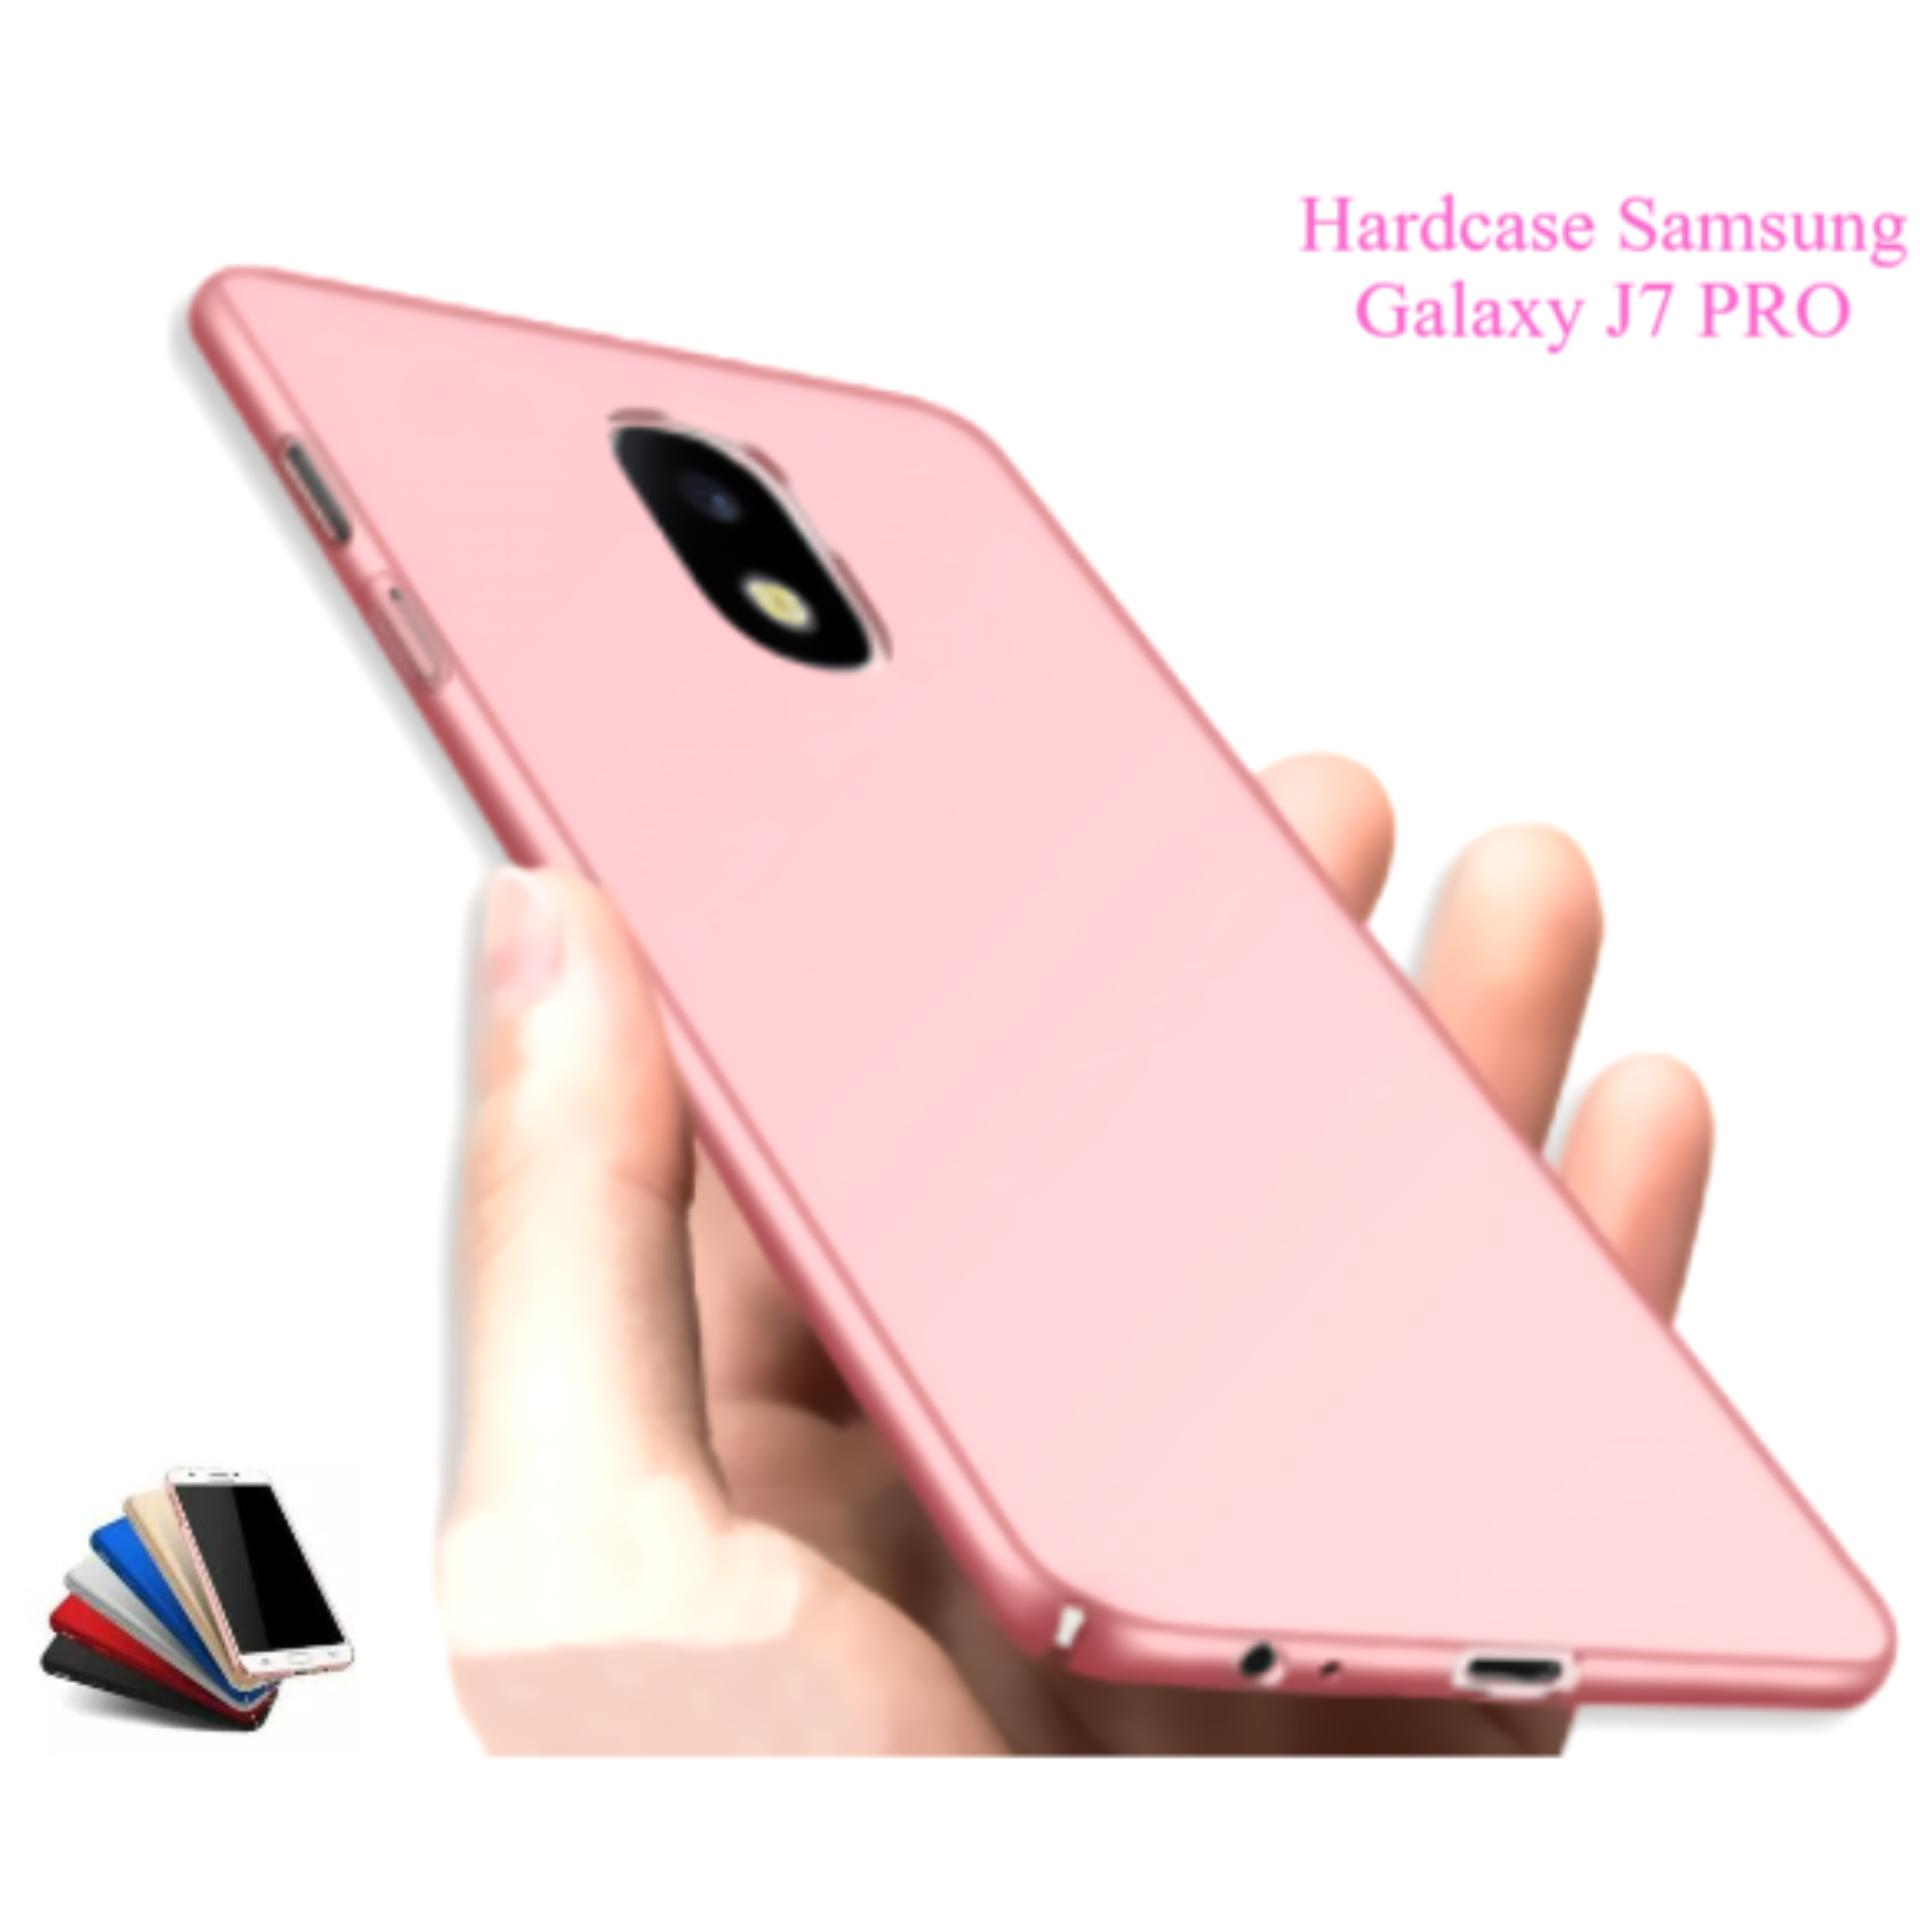 Beli Hardcase Casing Cover Hp Samsung Galaxy J7 Pro Hitam Biru Gold Merah Rose Gold Abs Secara Angsuran